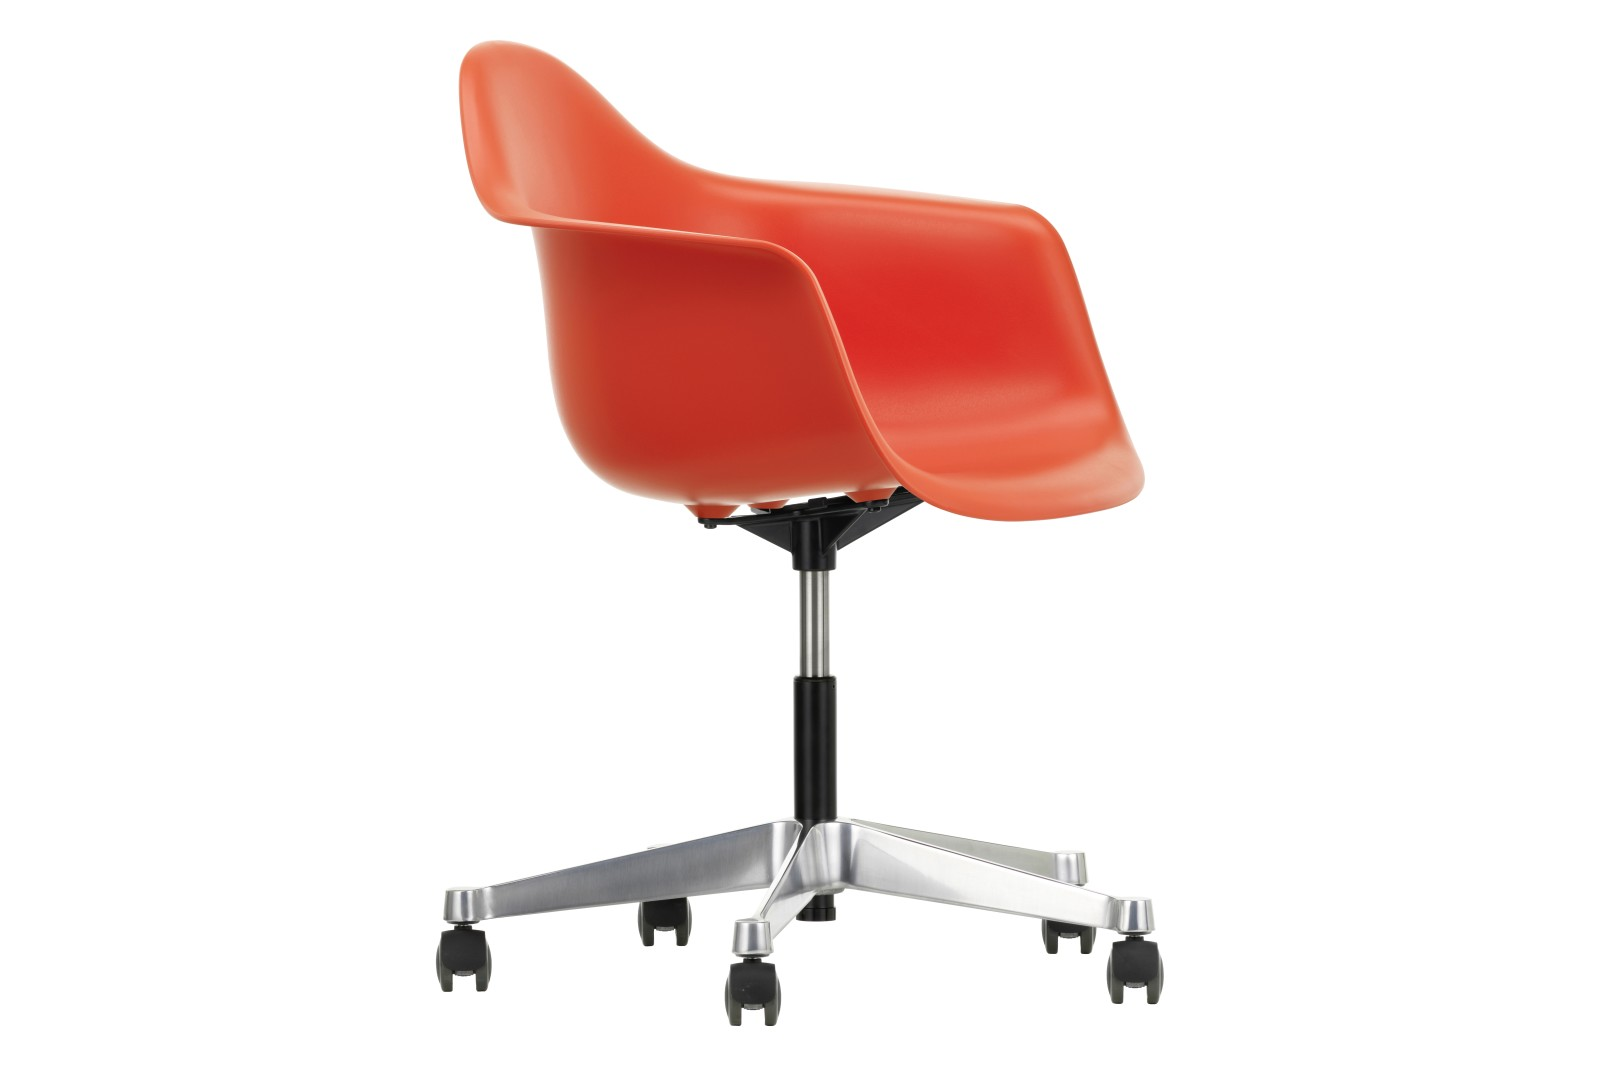 PACC Eames Plastic Armchair 03 red, 02 castors hard - braked for carpet